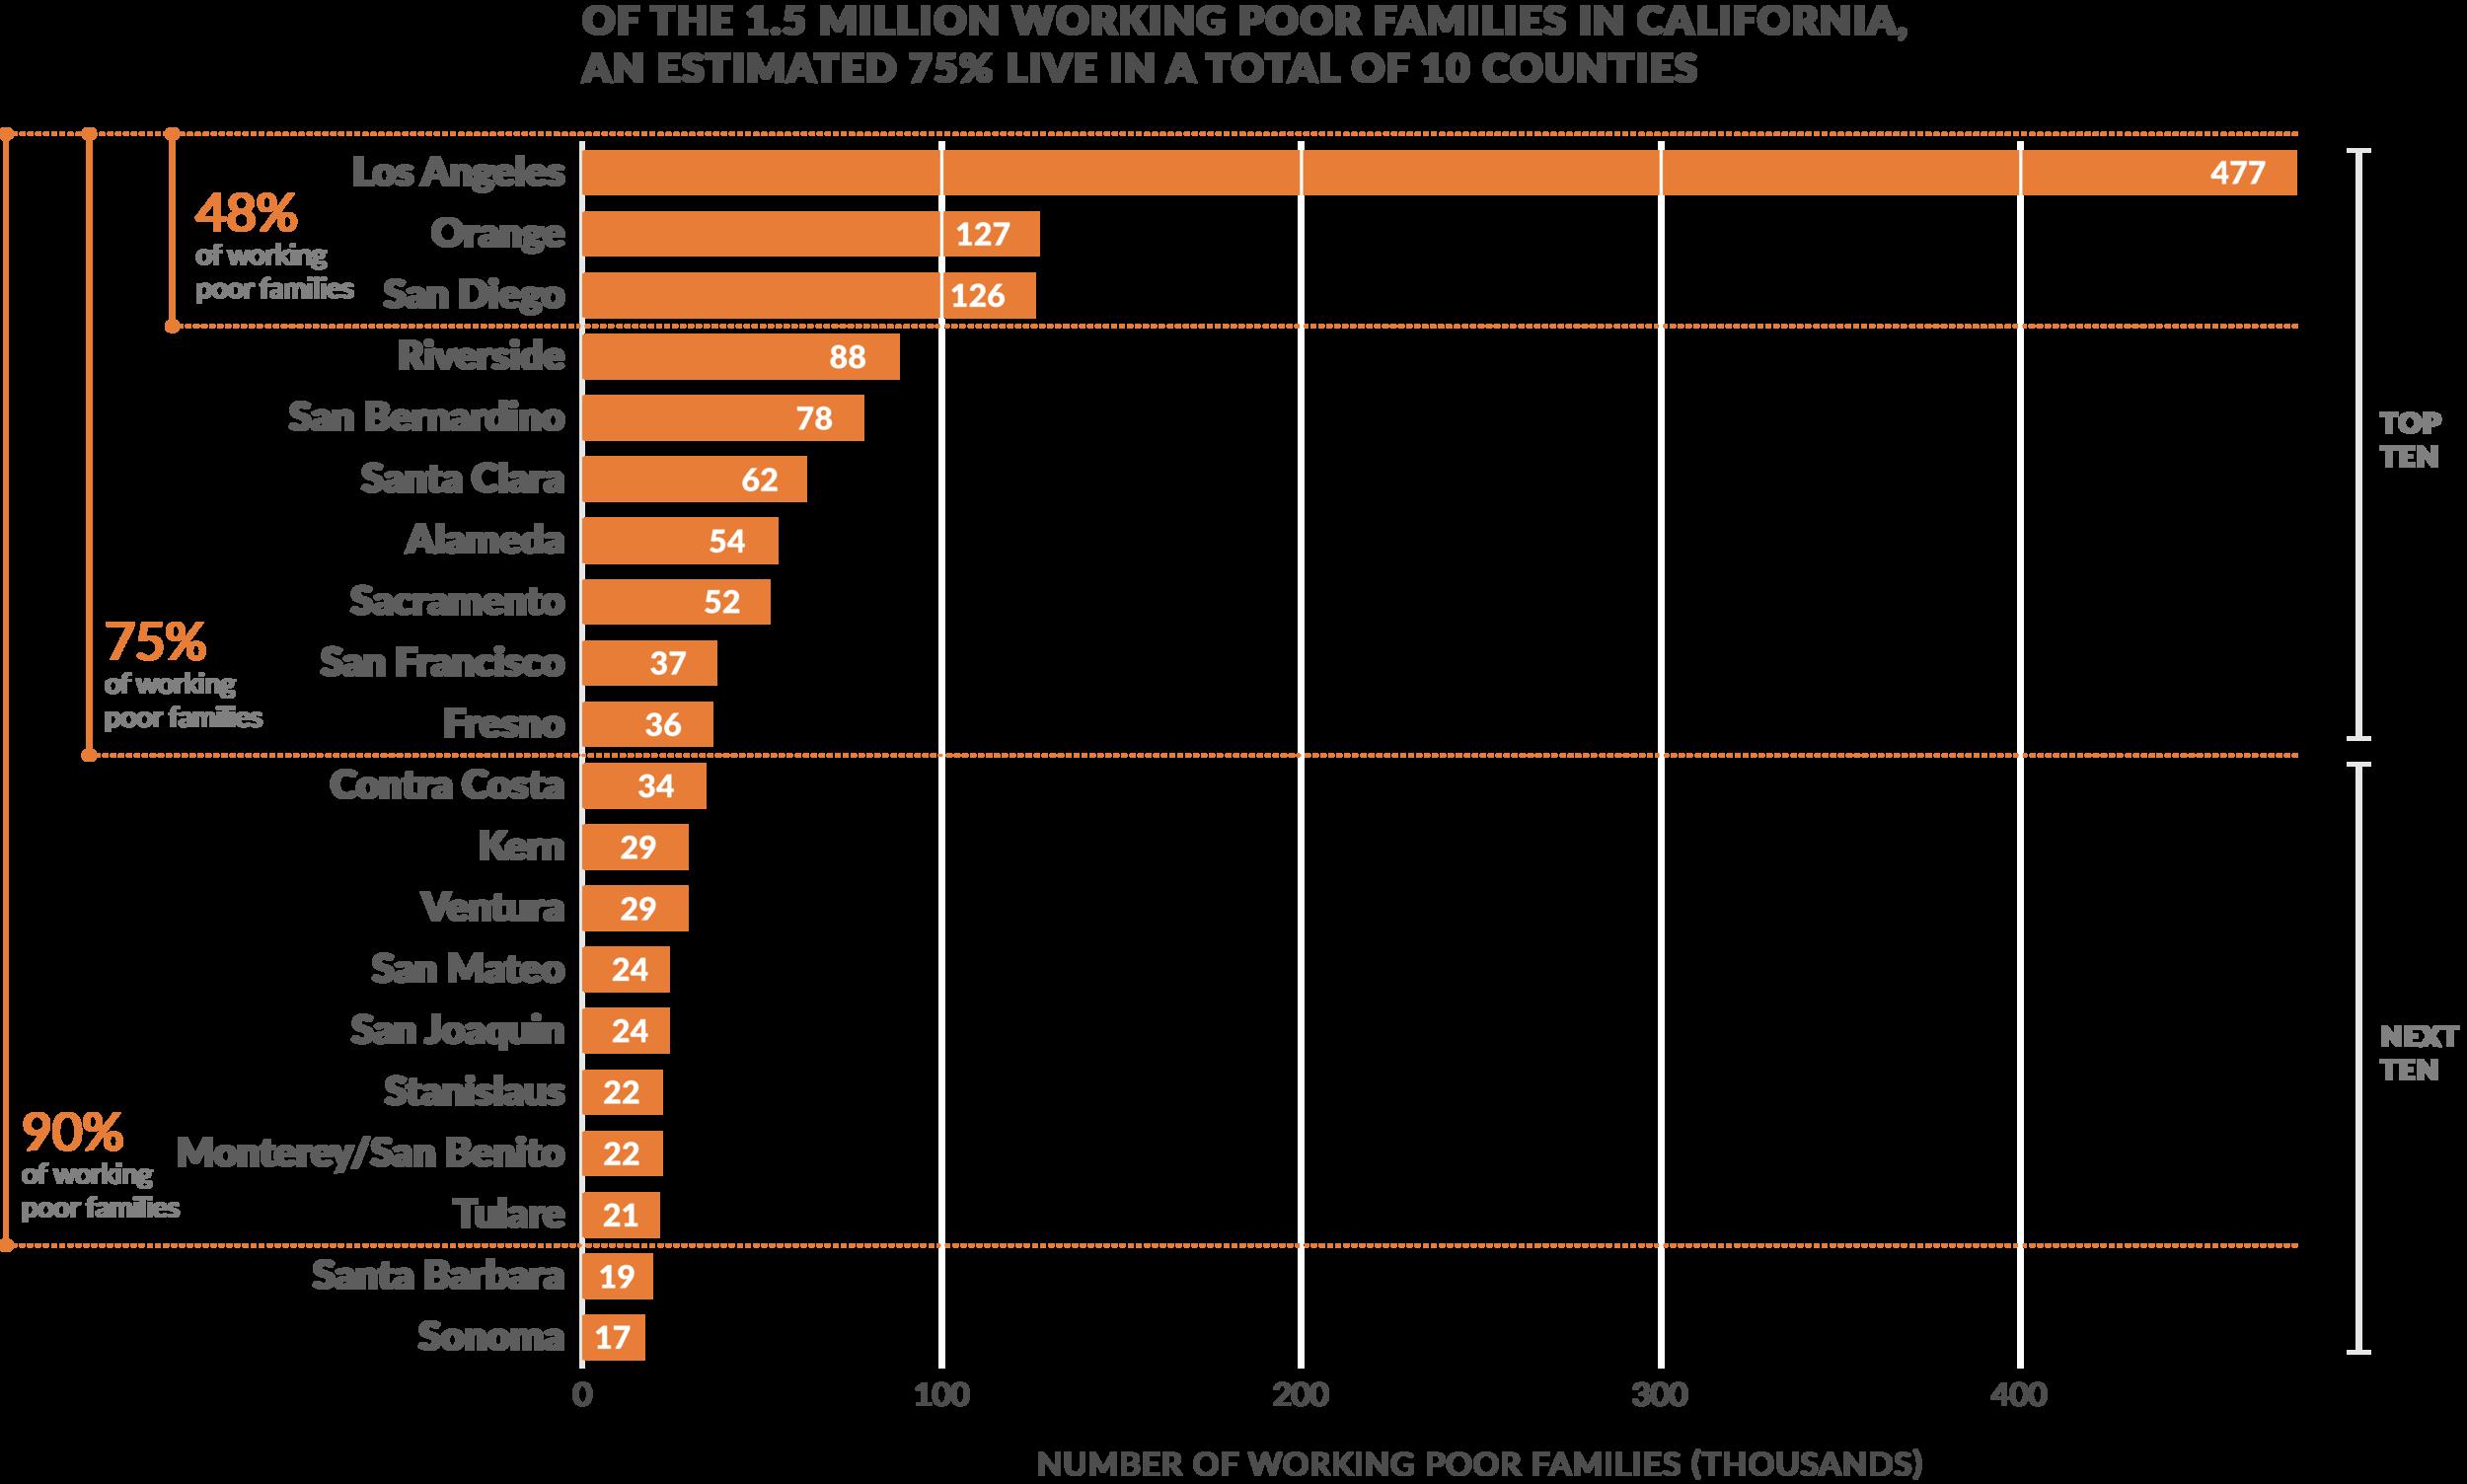 Source: The U.S. Census,  Public Policy Institute of California , Monitor Institute analysis 2012-2014